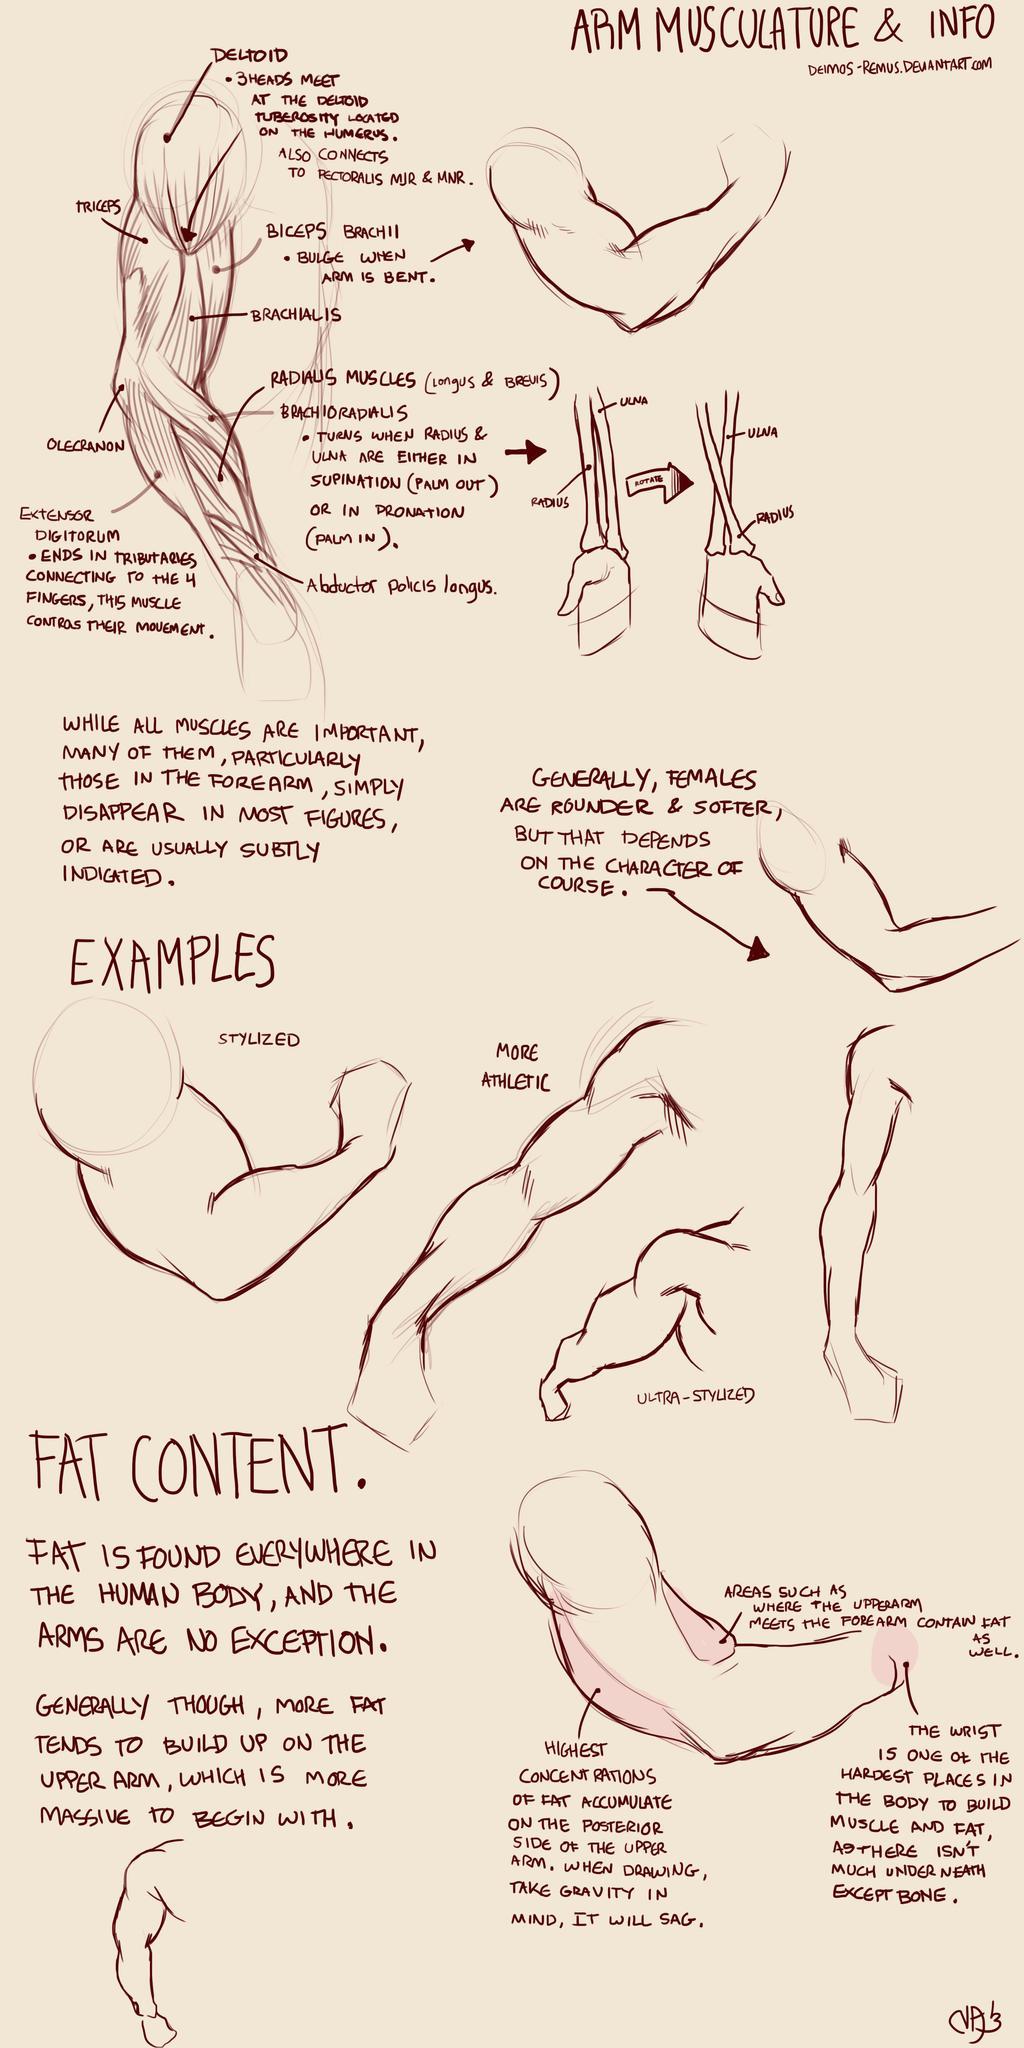 Arm Muscles 101 by Deimos-Remus on DeviantArt